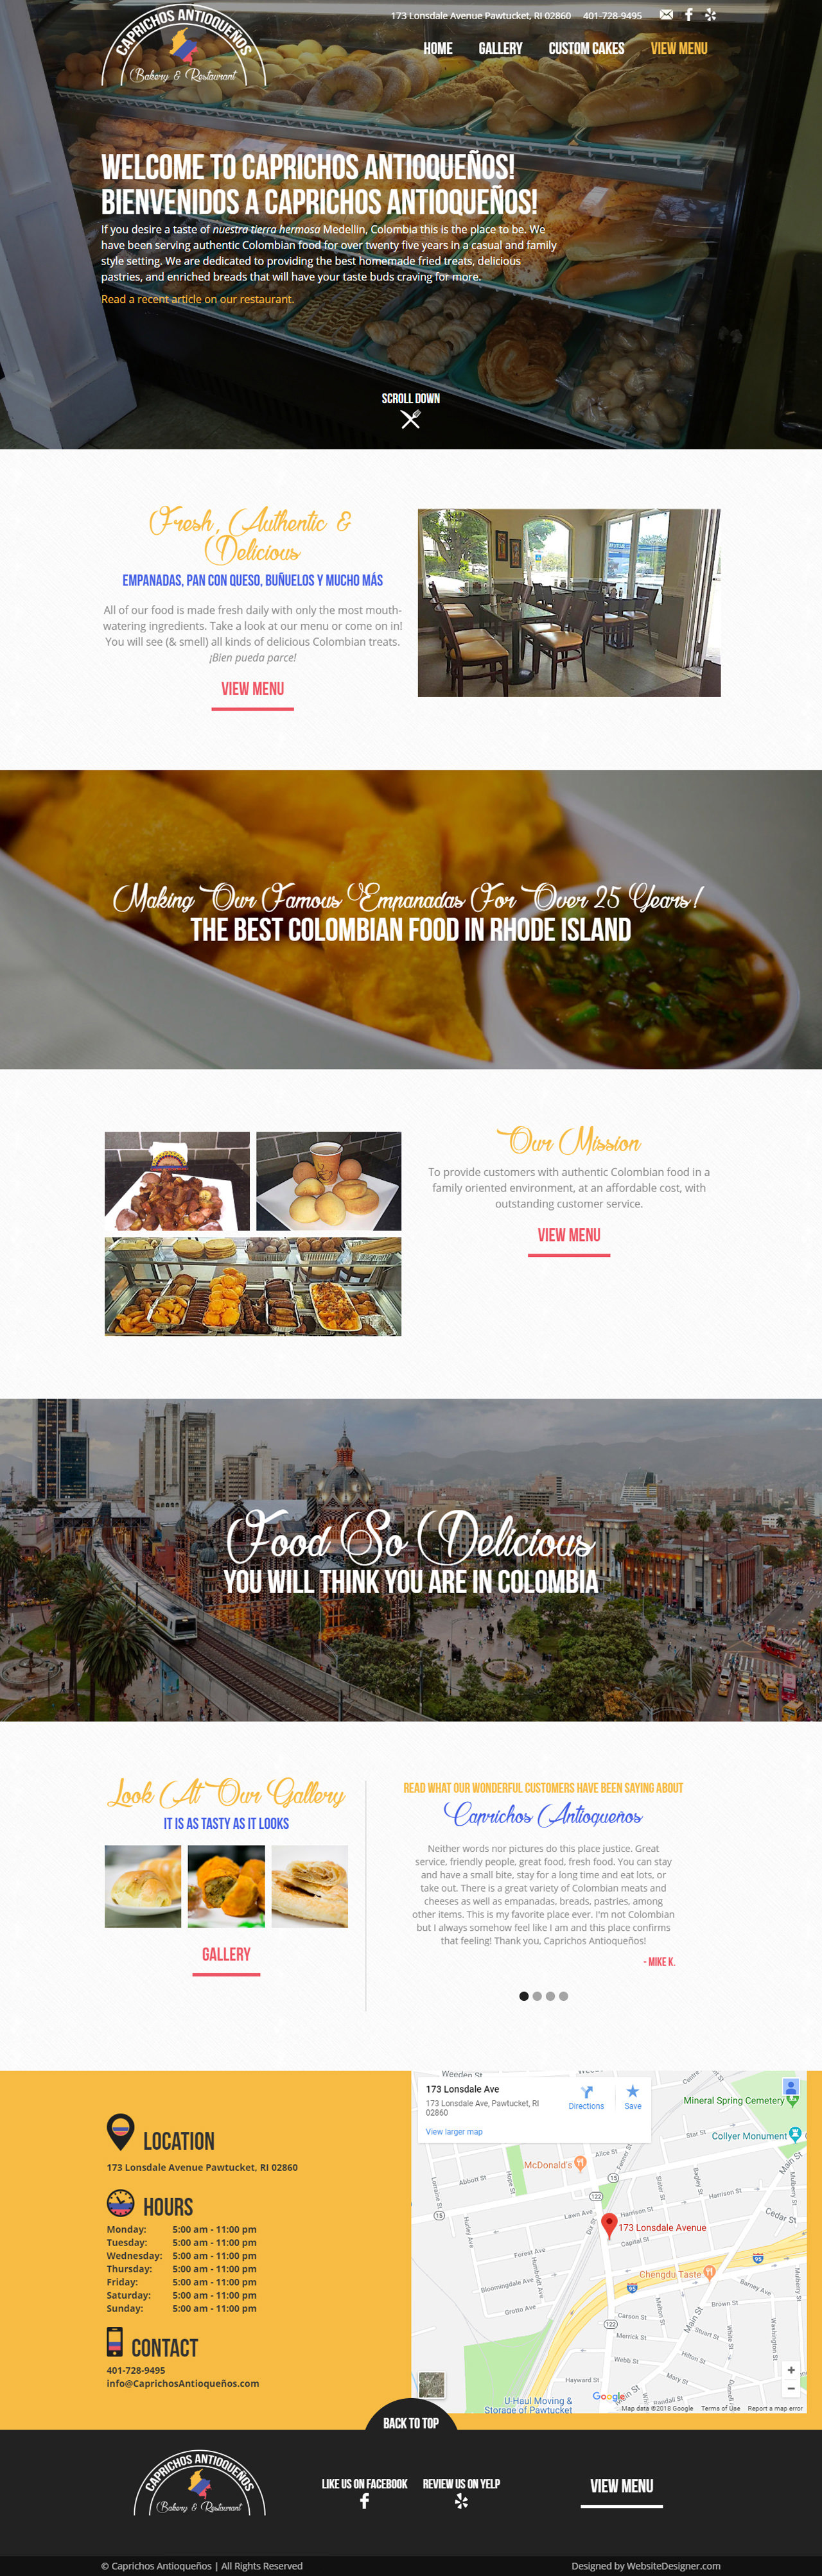 Caprichos Antioqueños Bakery & Restaurant Home Page